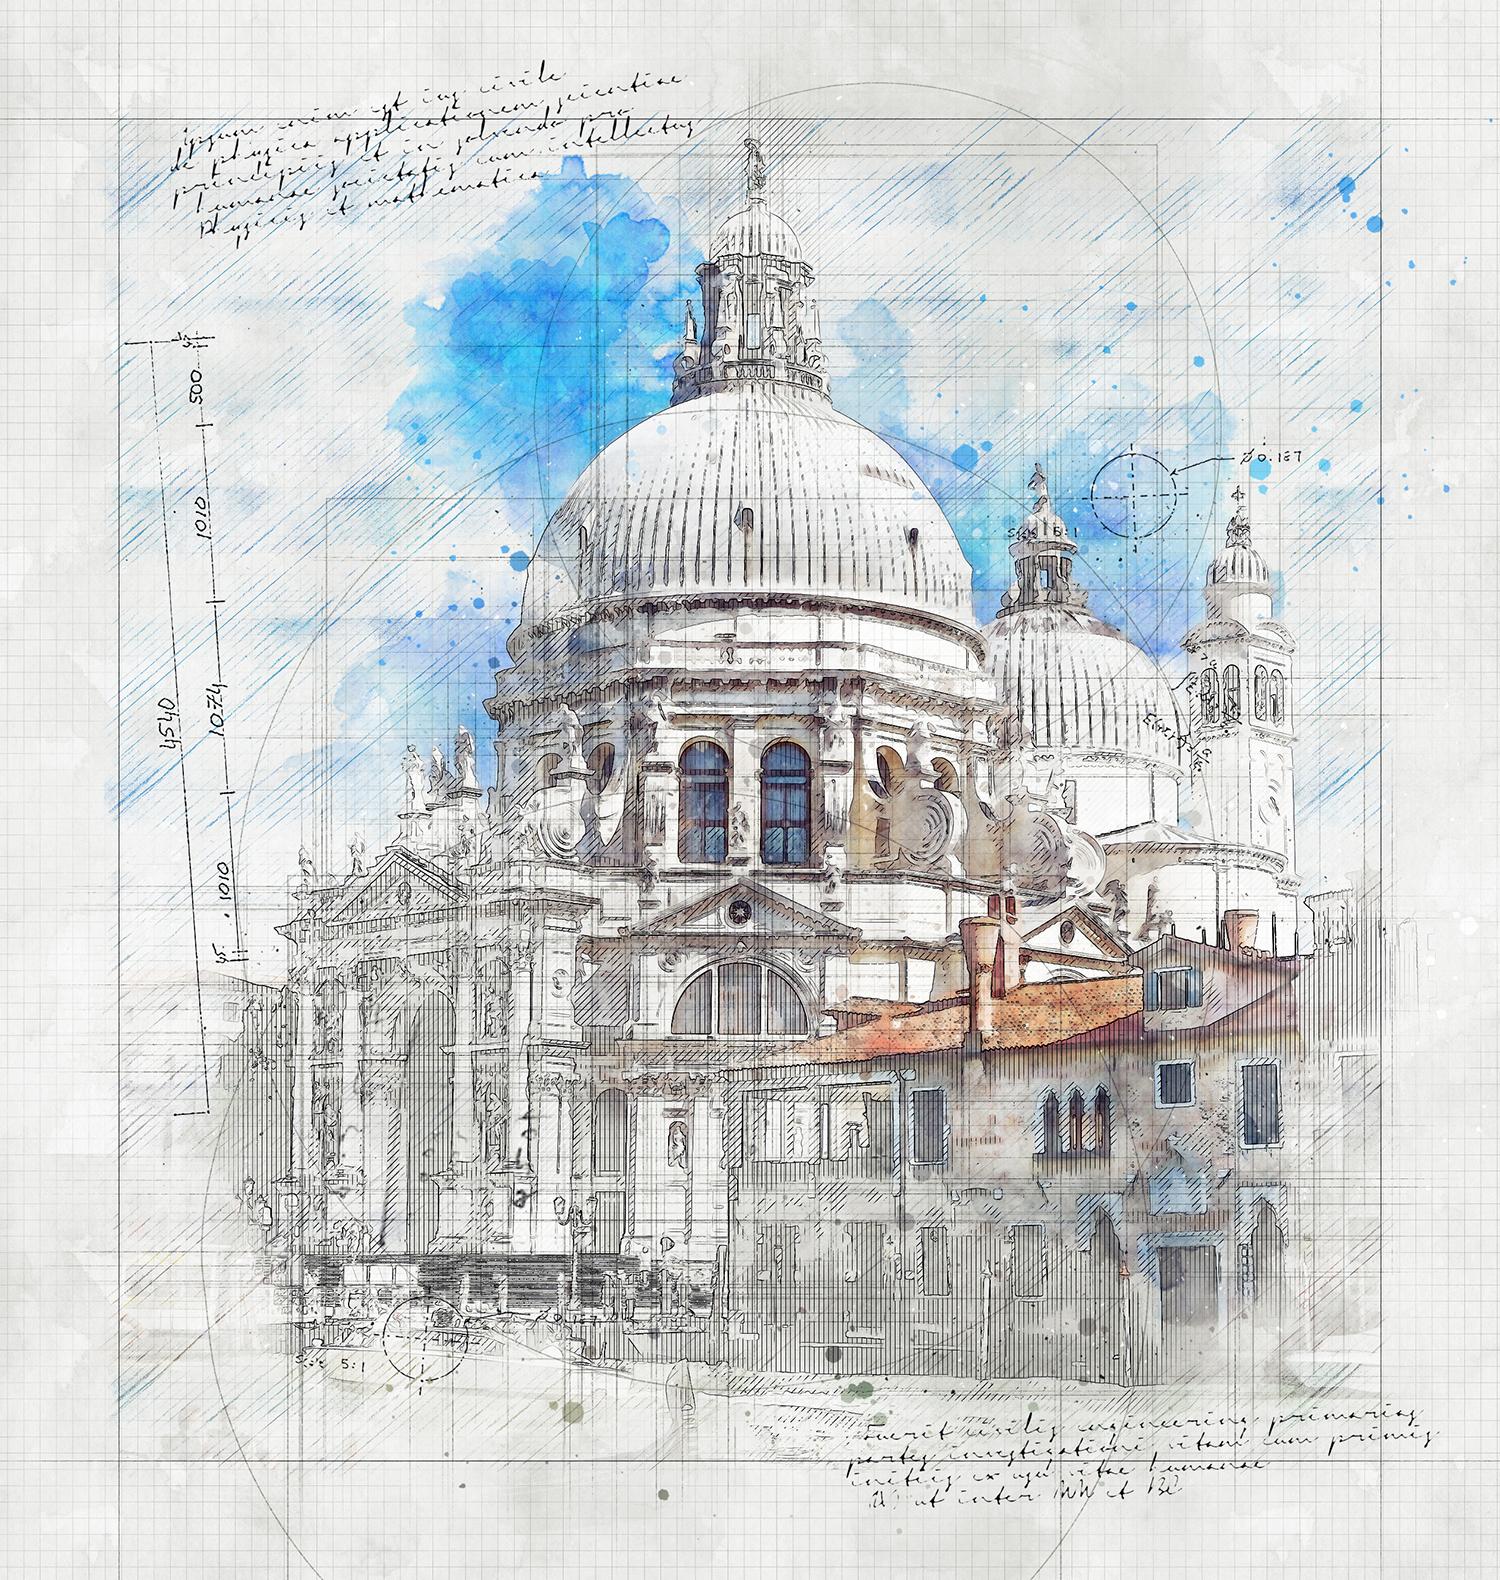 [Image: architecture_sketch_01.jpg]